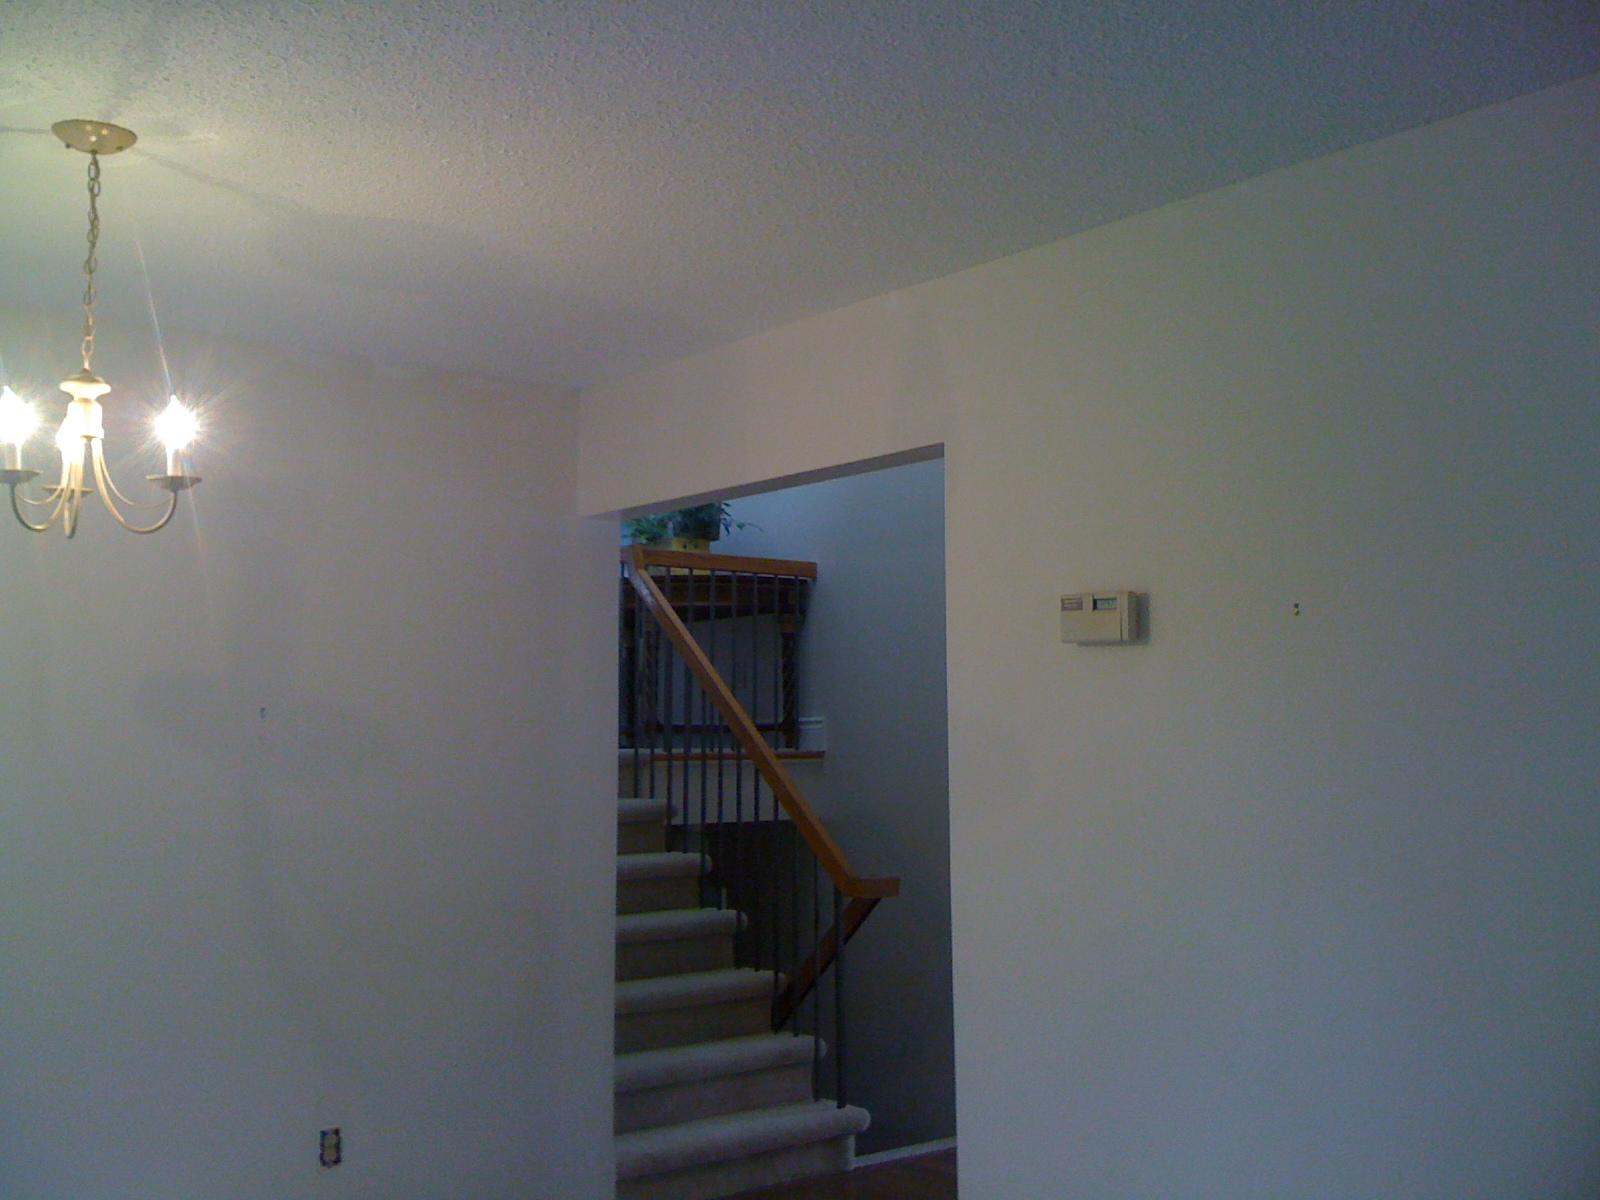 Primed room